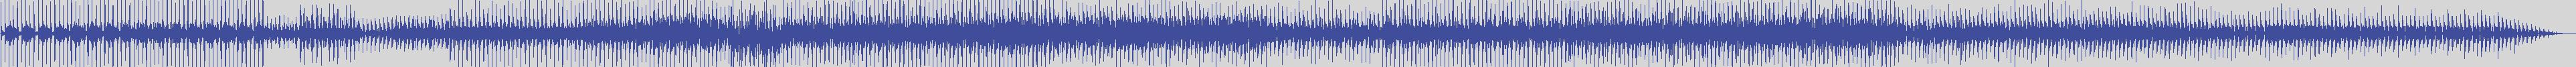 just_digital_records [JS1316] 40 Drums - Tribe Destiny [Original Mix] audio wave form